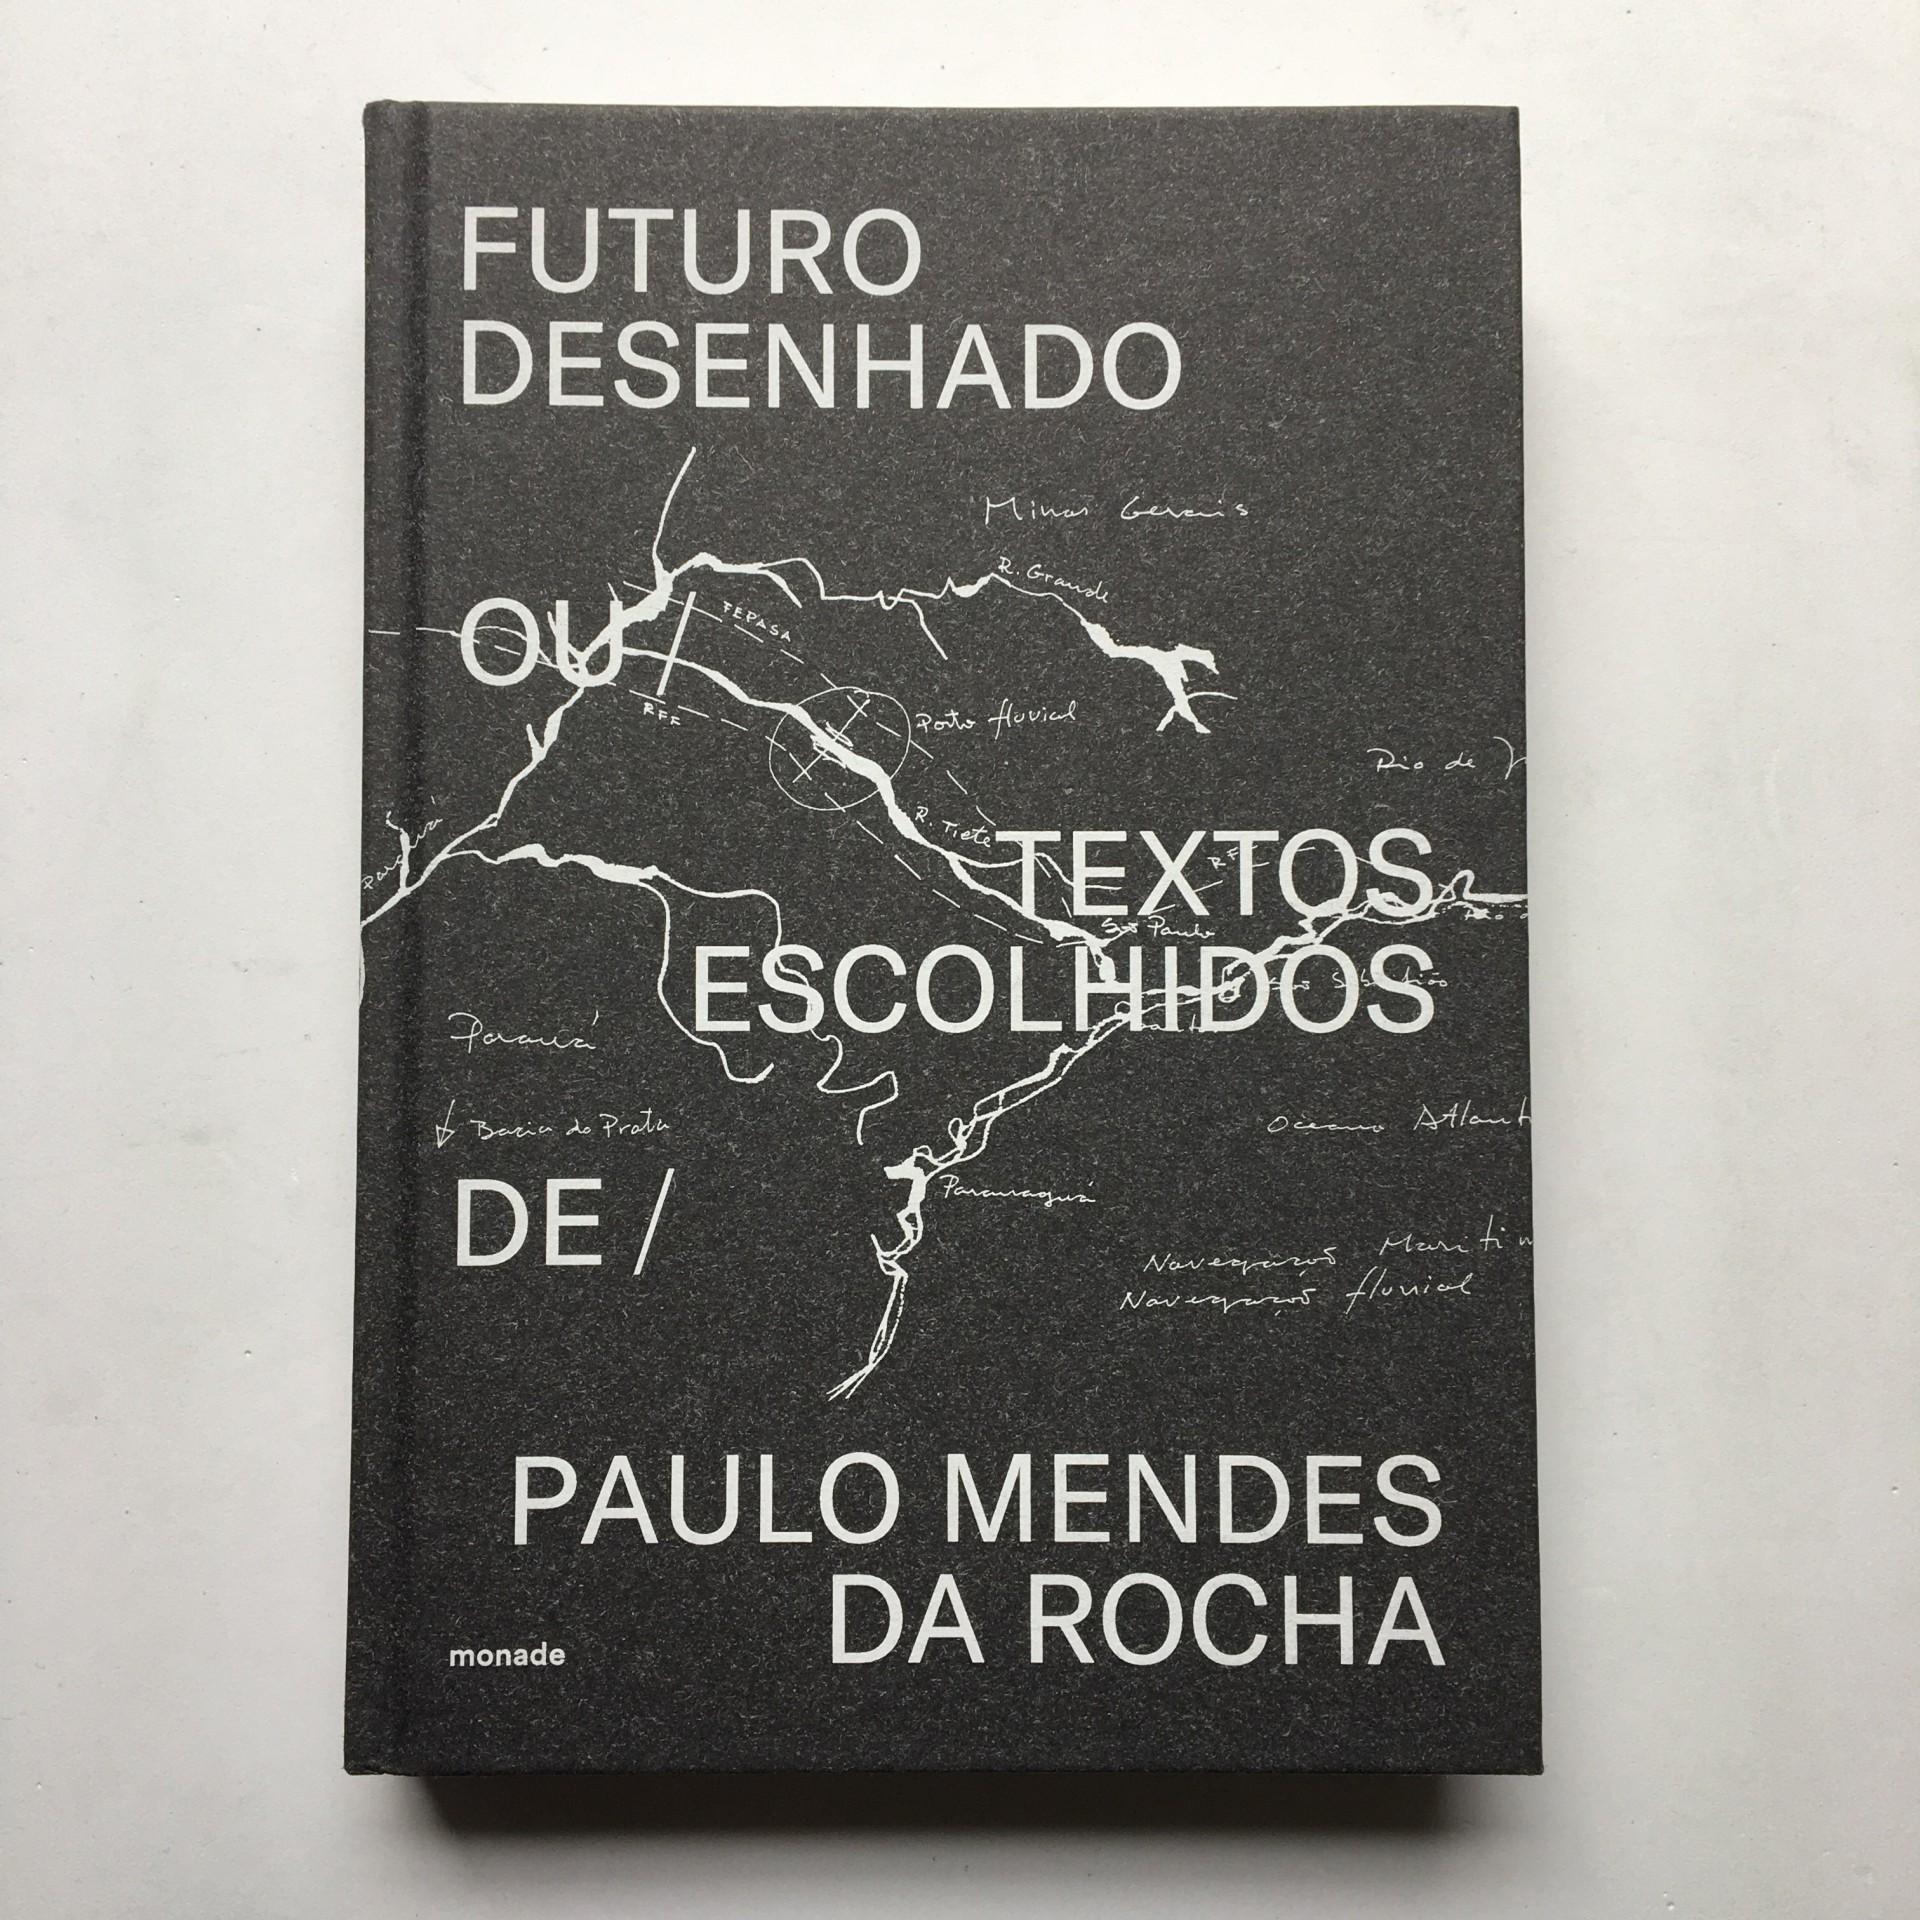 Futuro Desenhado / Paulo Mendes da Rocha